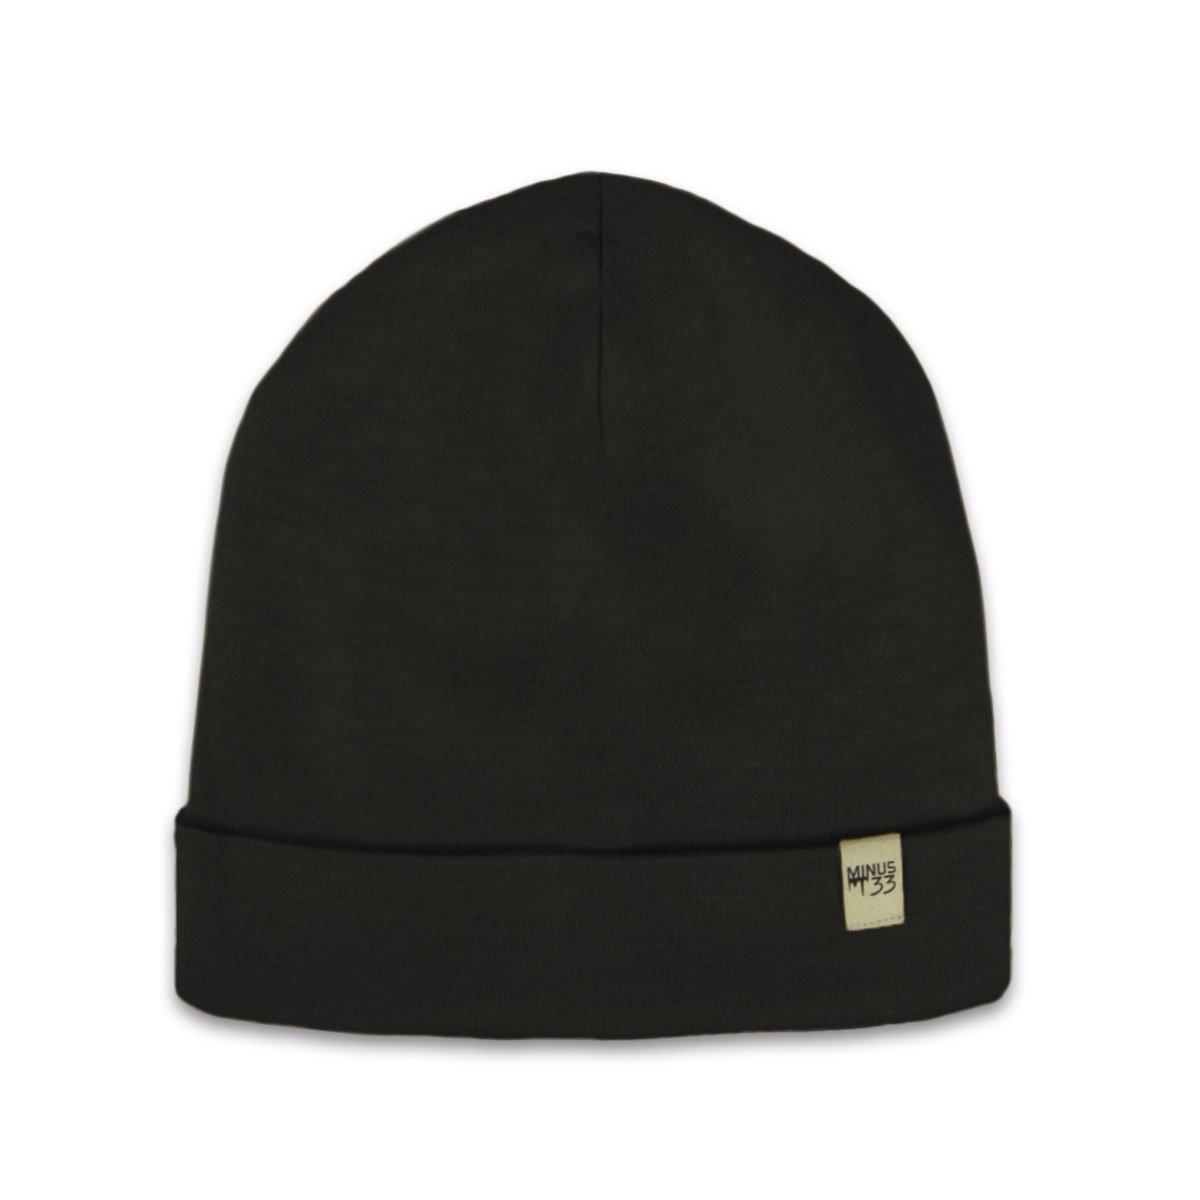 Amazon.com  Minus33 Merino Wool Ridge Cuff Beanie Black One Size  Sports    Outdoors e9e9f4495b33